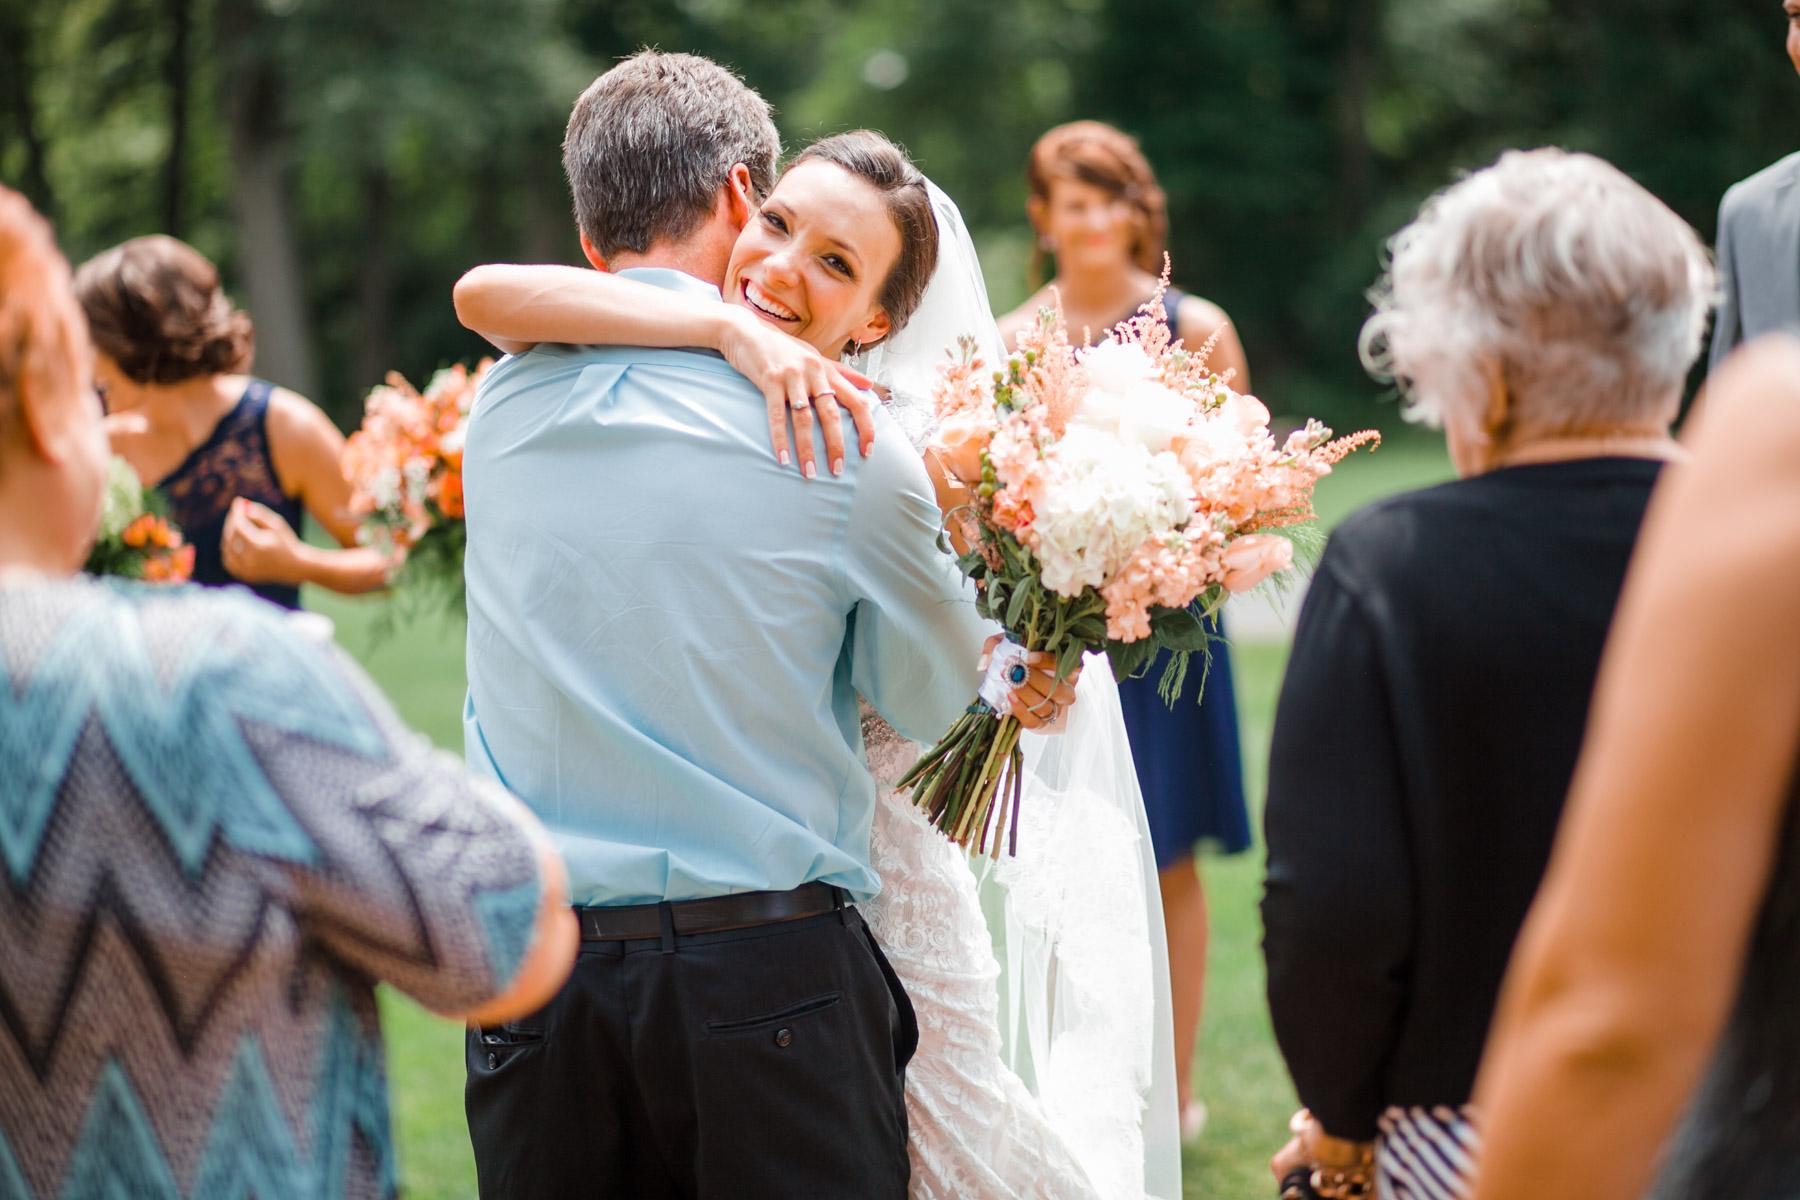 wildwood-park-wedding-photos-48.jpg